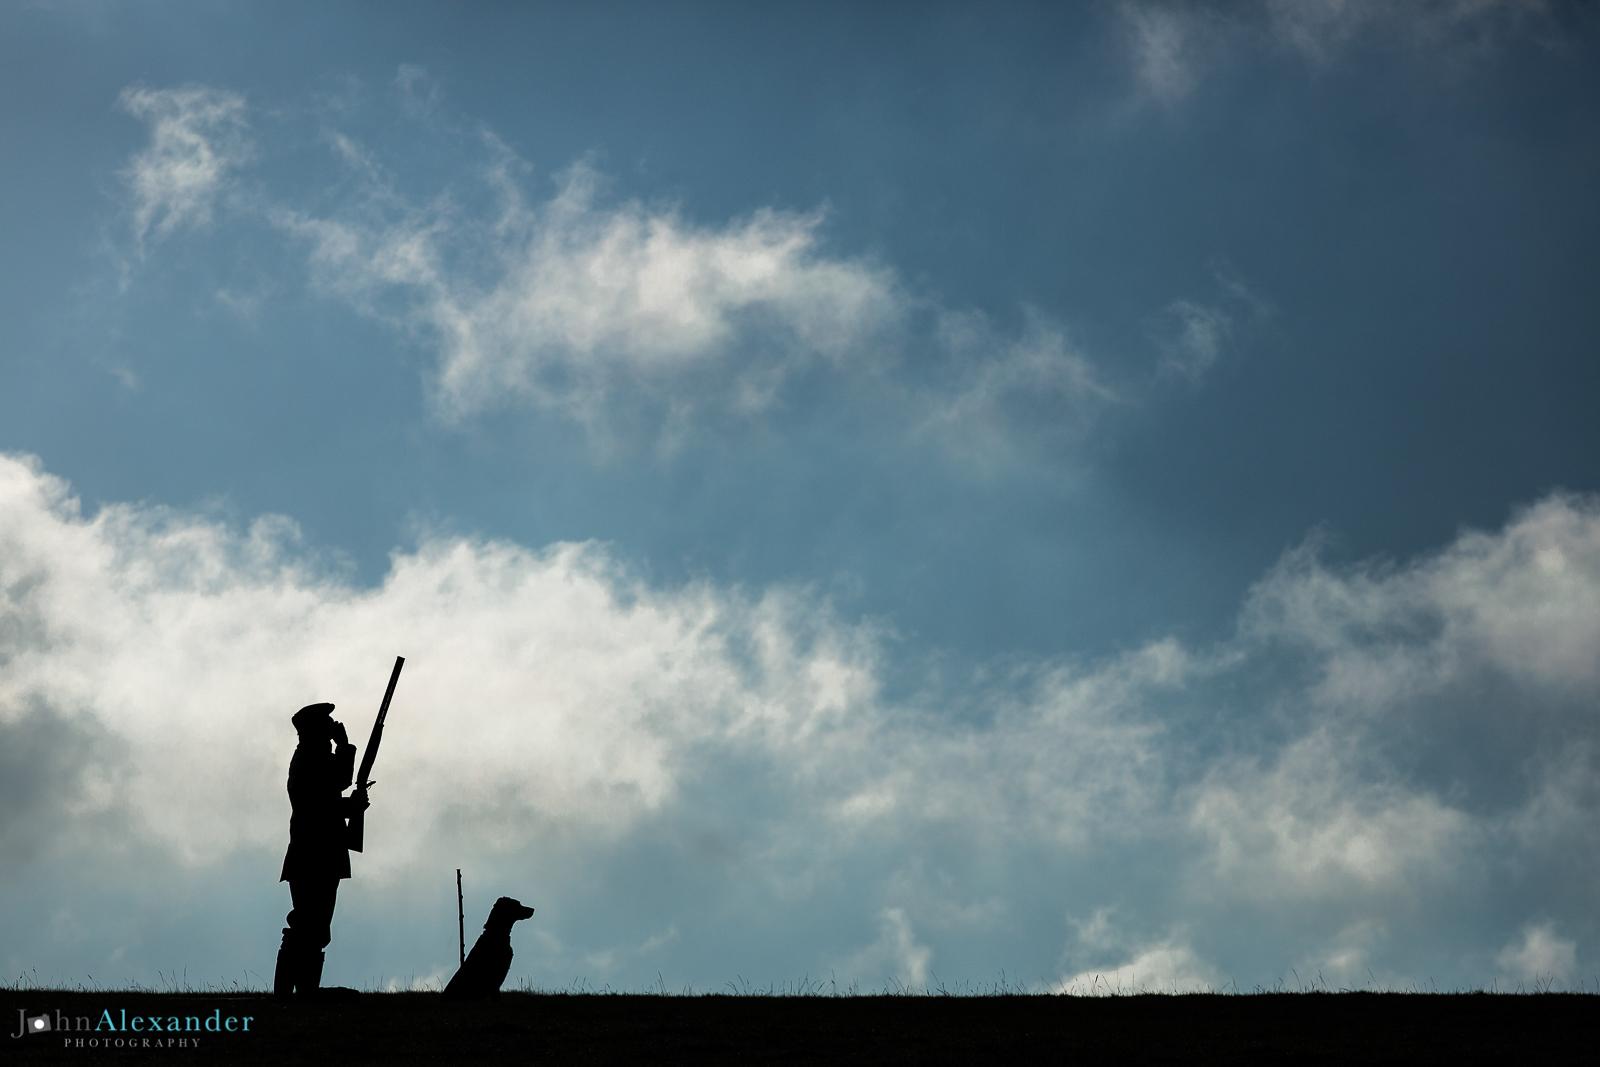 silhouette of gun and gun dog in blue sky